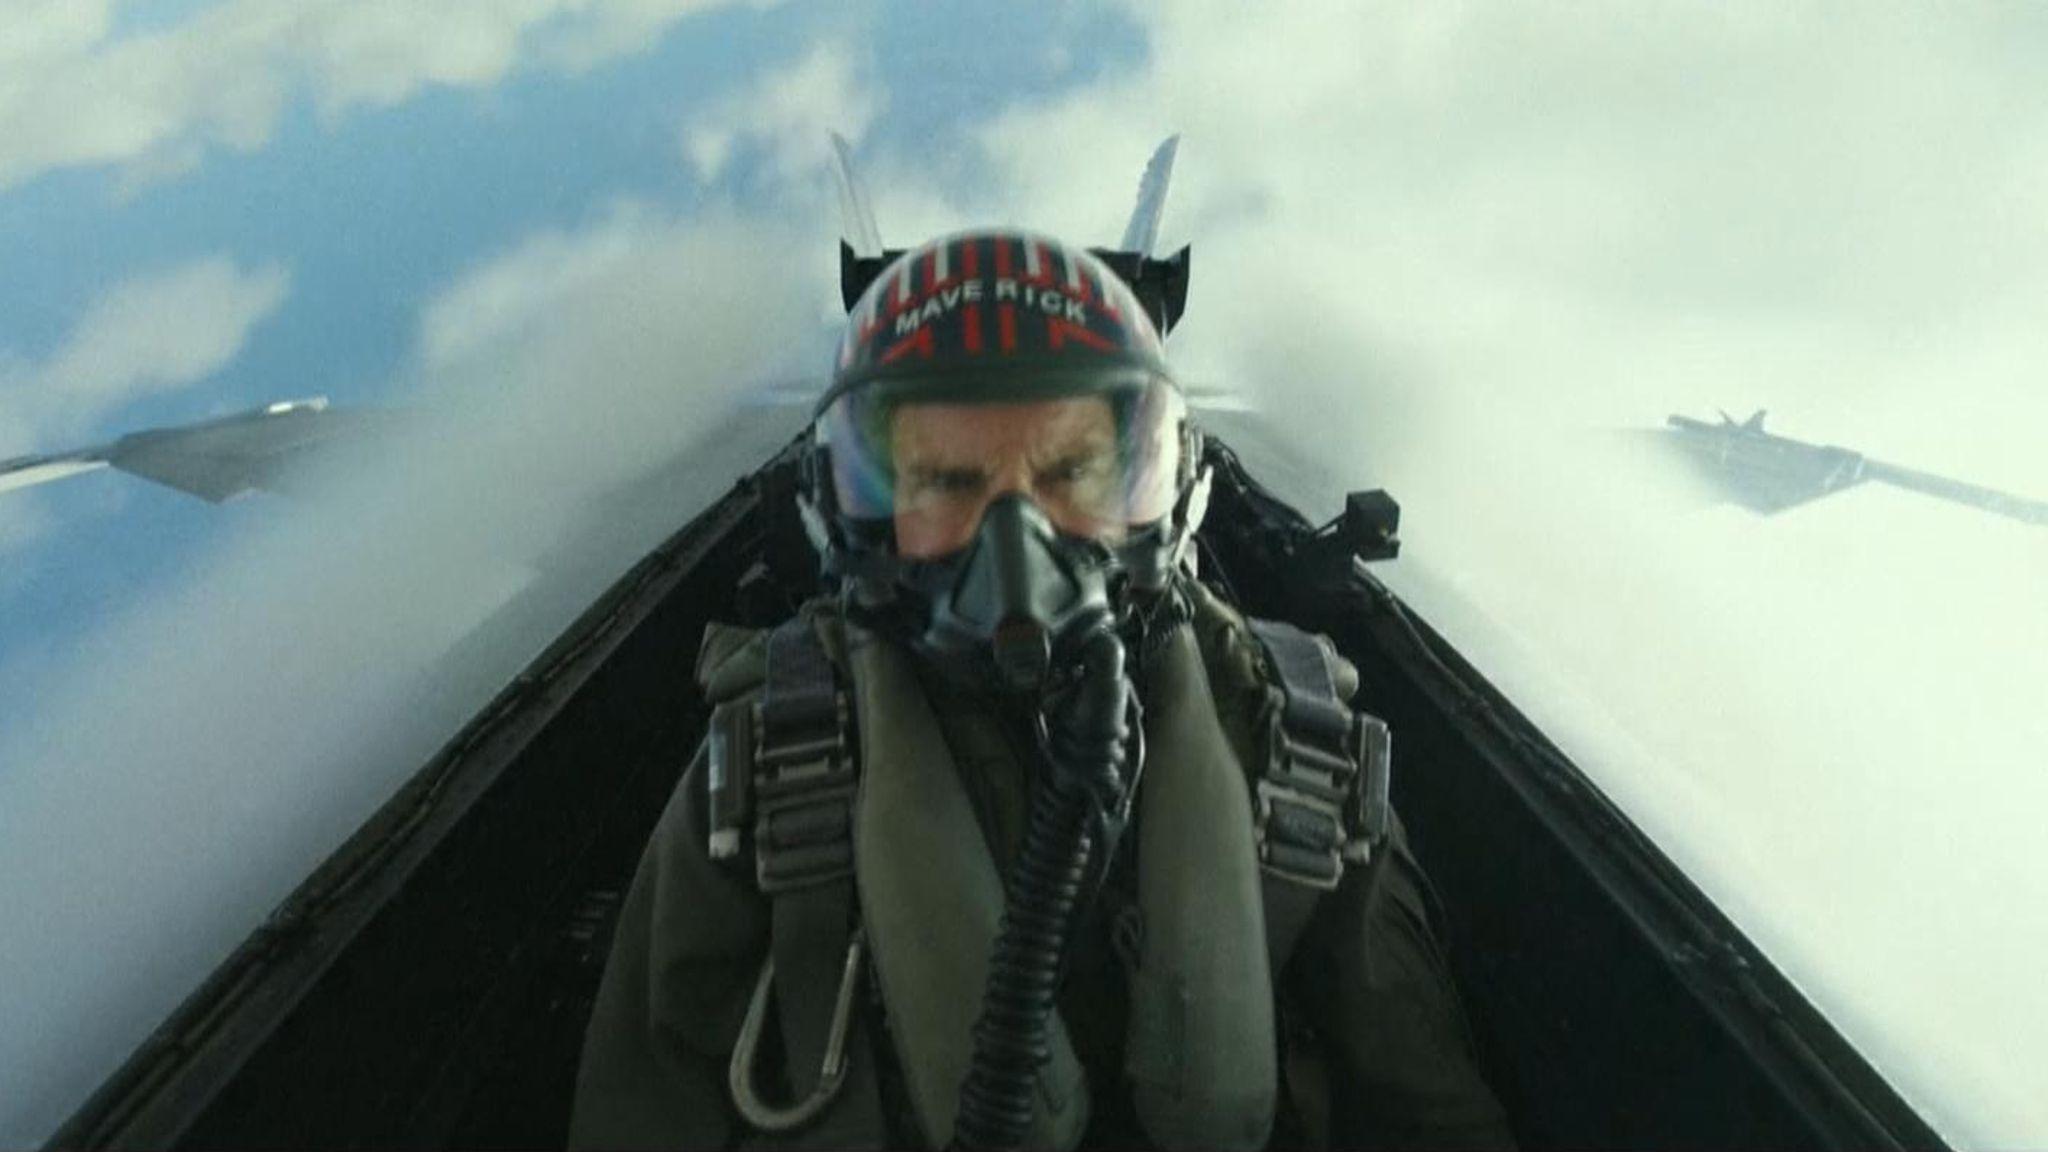 """Top Gun: Maverick"" is directed by Joseph Kosinski, taking off in theatres June 2020."